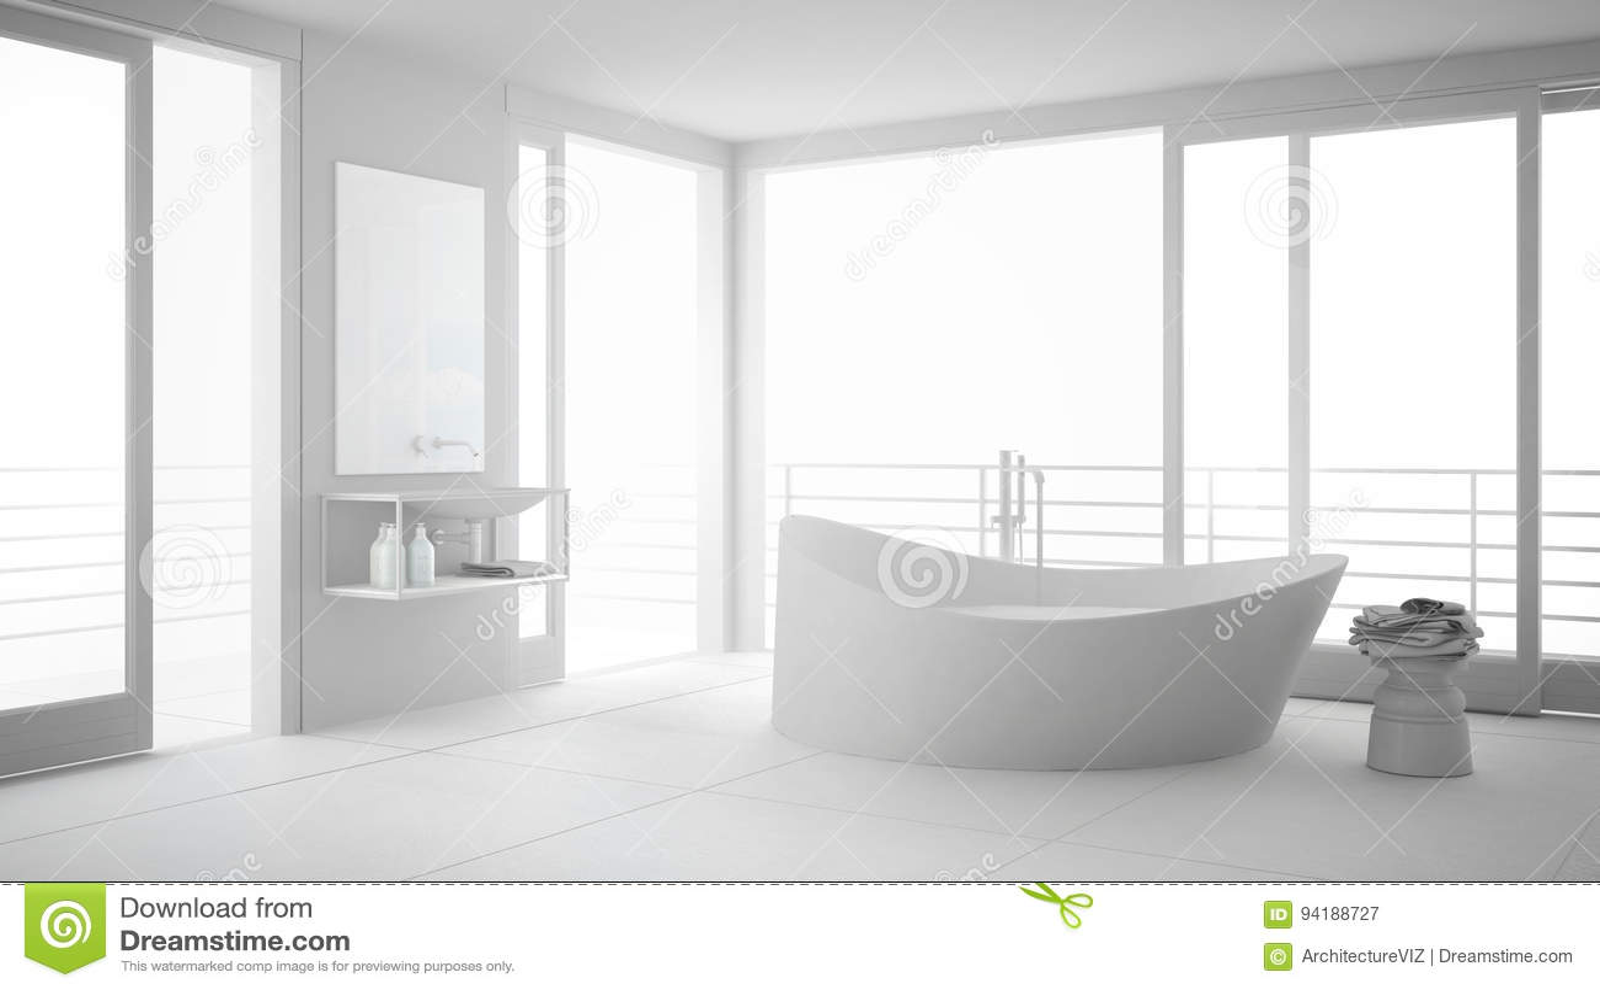 Total White Minimalist Bathroom With Big Bath Tub And Panoramic ...